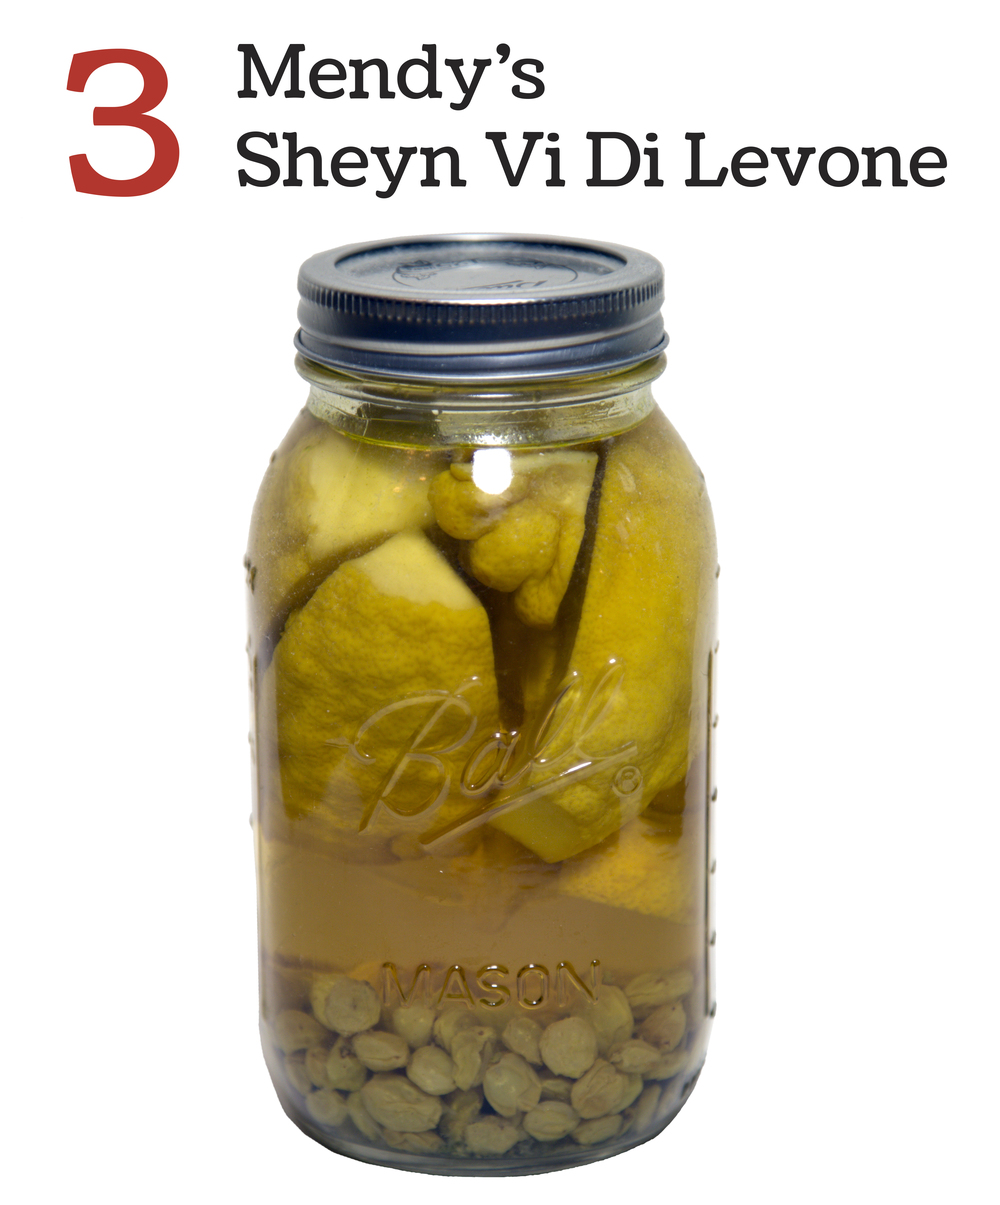 3Mendy's Sheyn Vi Di Levone